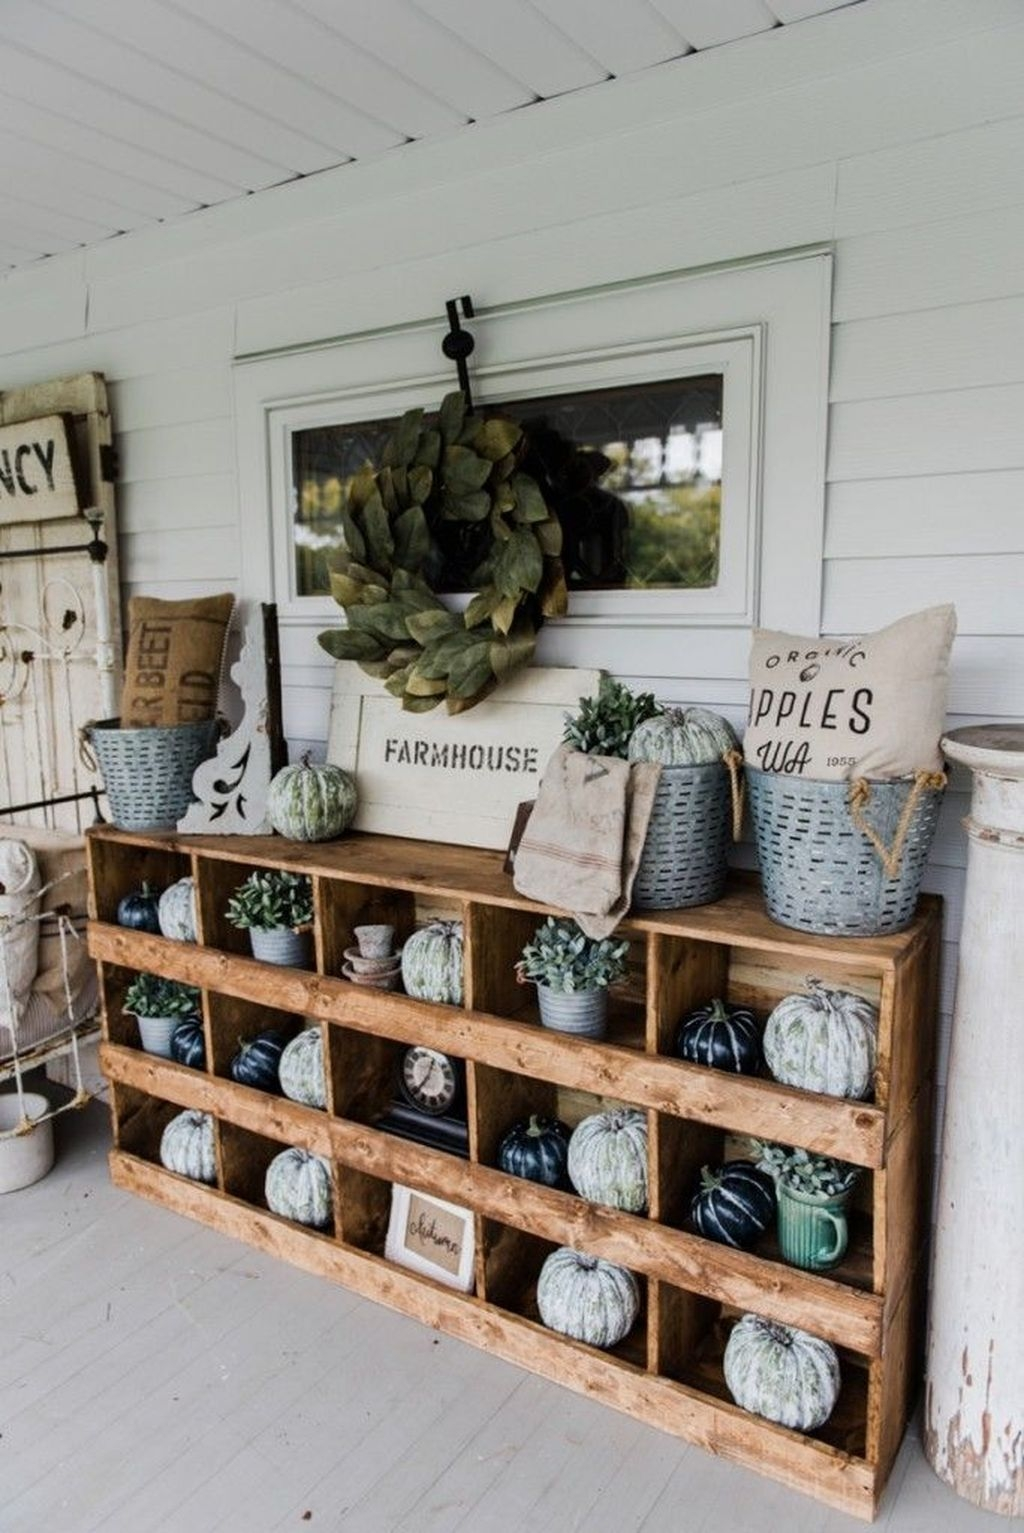 Amazing Diy Farmhouse Home Decor Ideas On A Budget 26